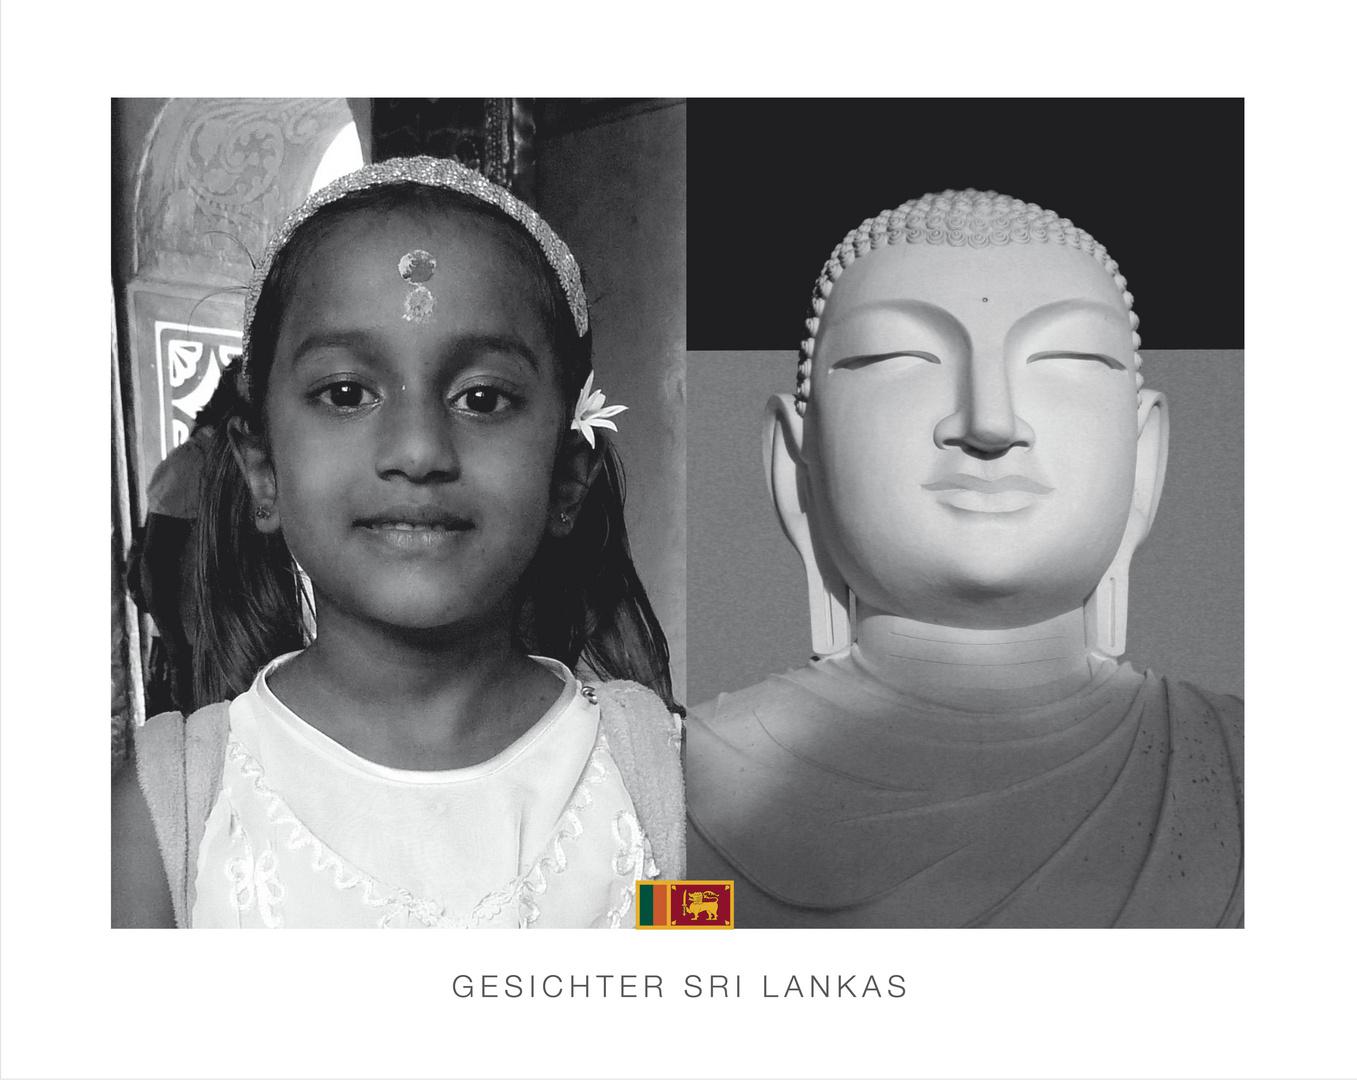 Gesichter Sri Lankas